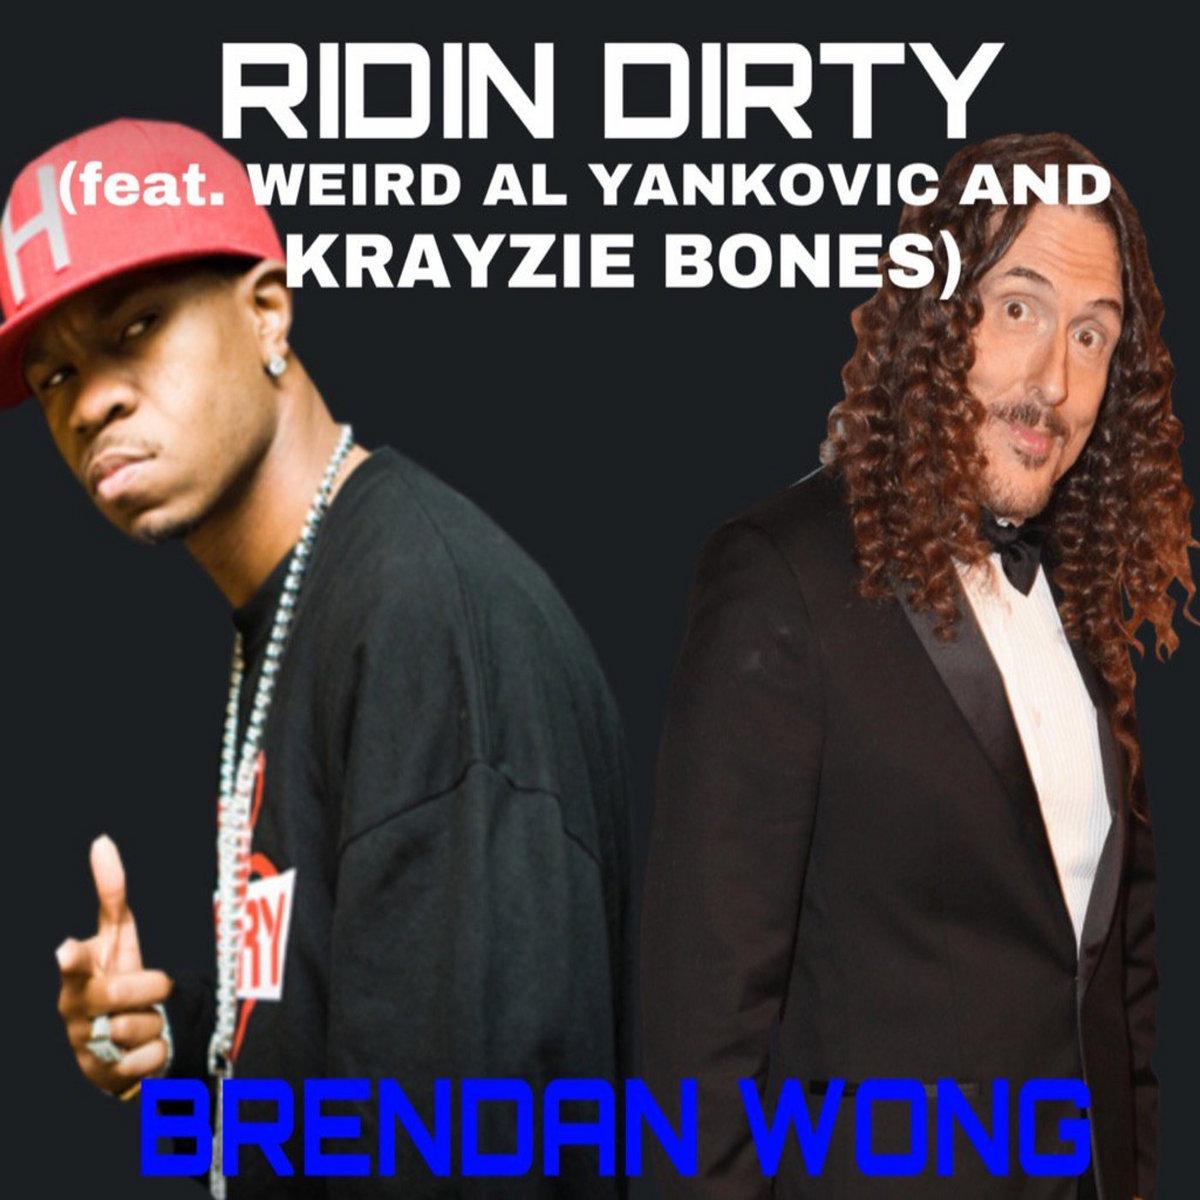 Ridin Dirty (feat. Weird Al Yankovic and Krayzie Bones) [Brendan ...